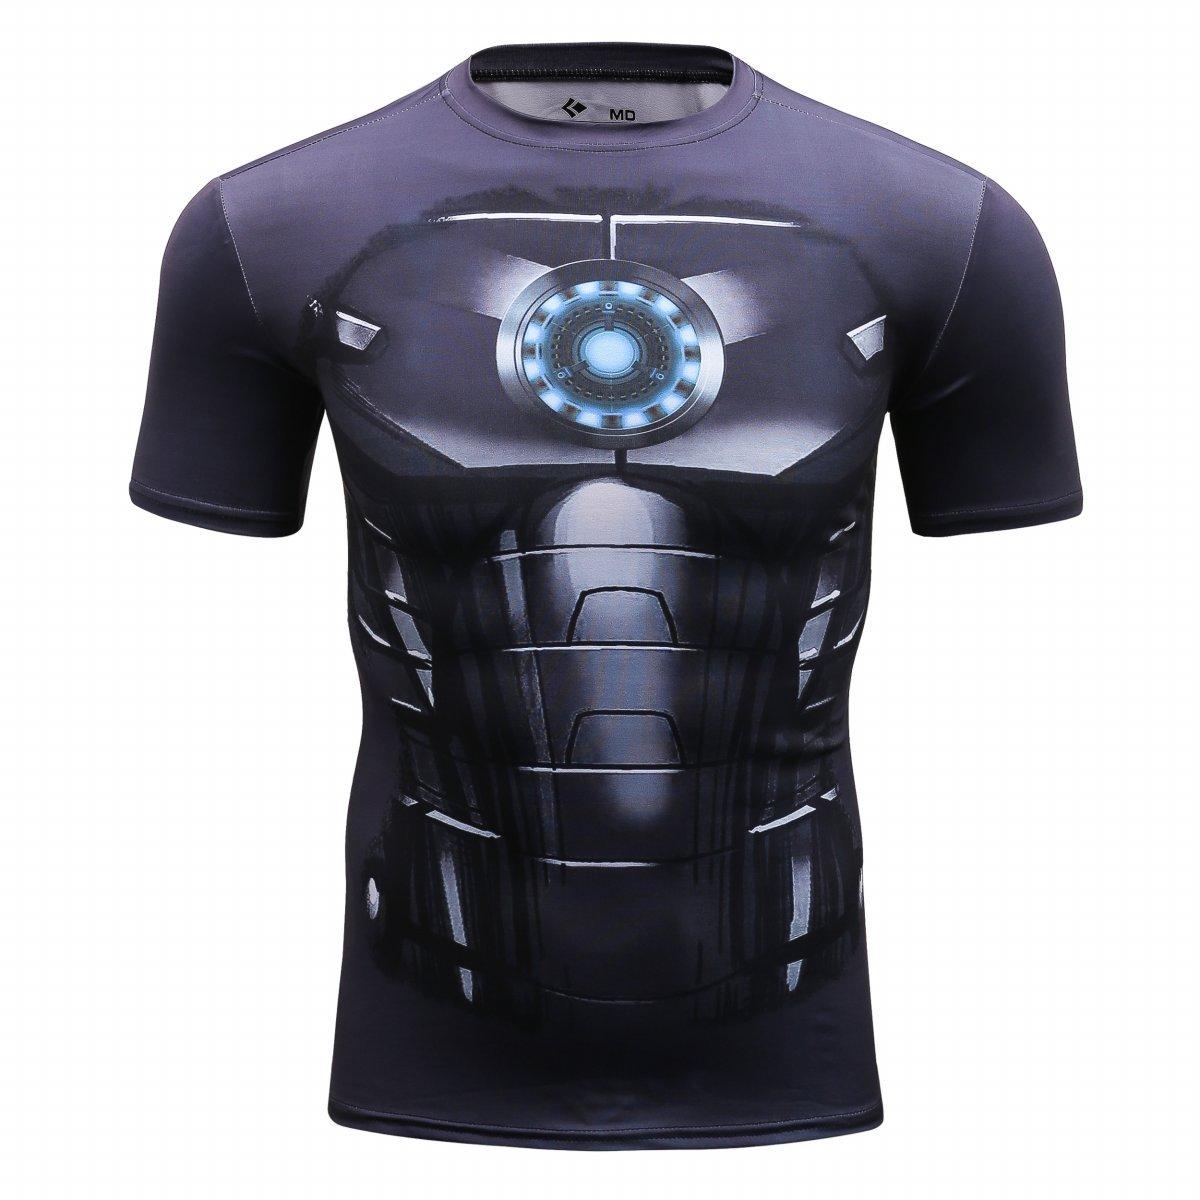 Cody Lundin firmemente Impreso aleeve Corto Camiseta Culturismo Masculino Camiseta Hombre Tops héroe Logo Hombres JMDT1097M